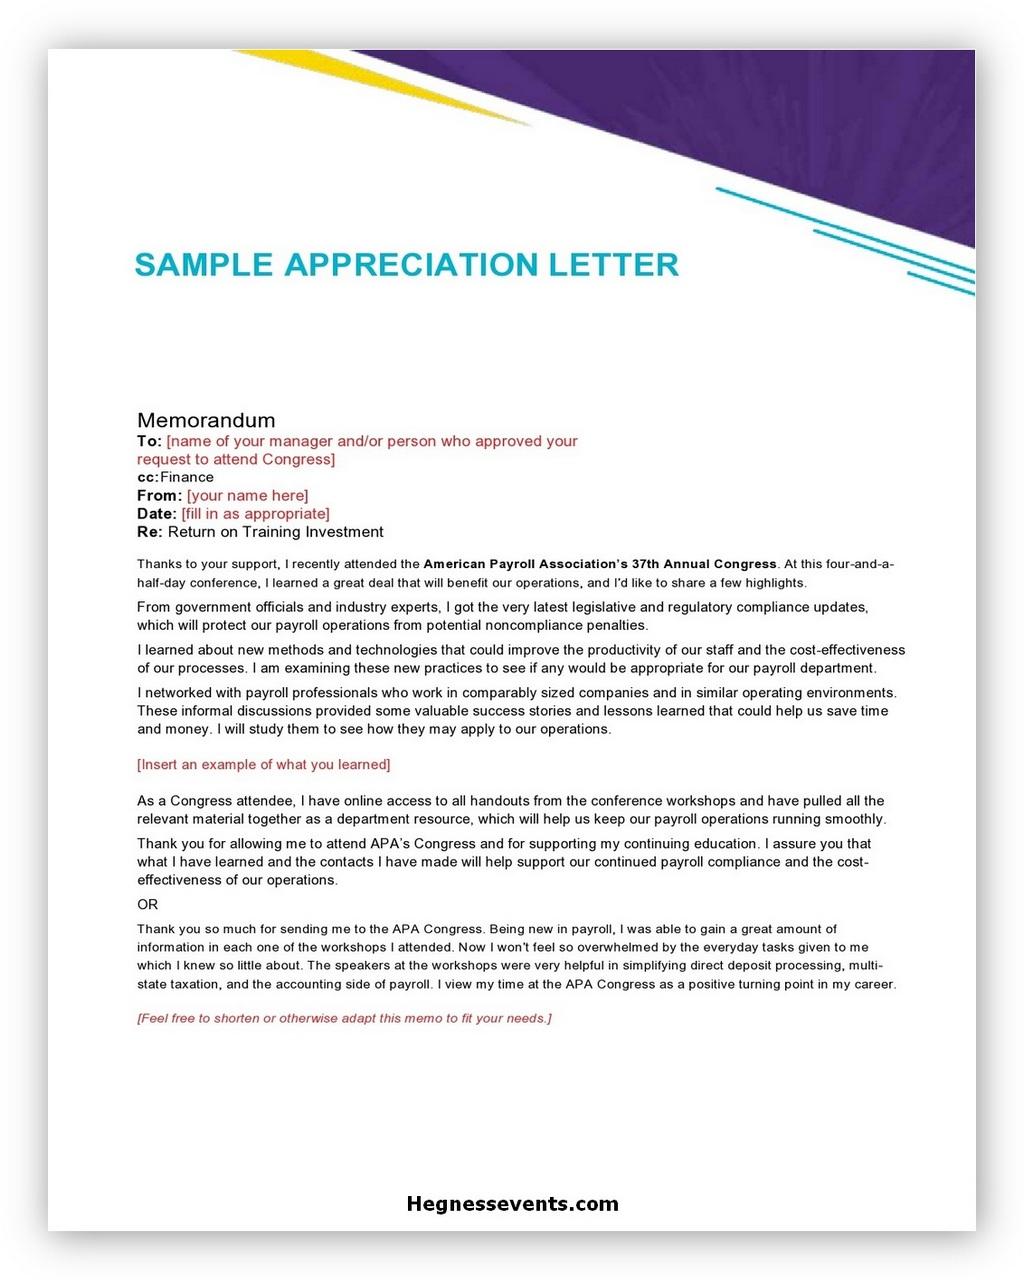 Appreciation Letter Sample 07